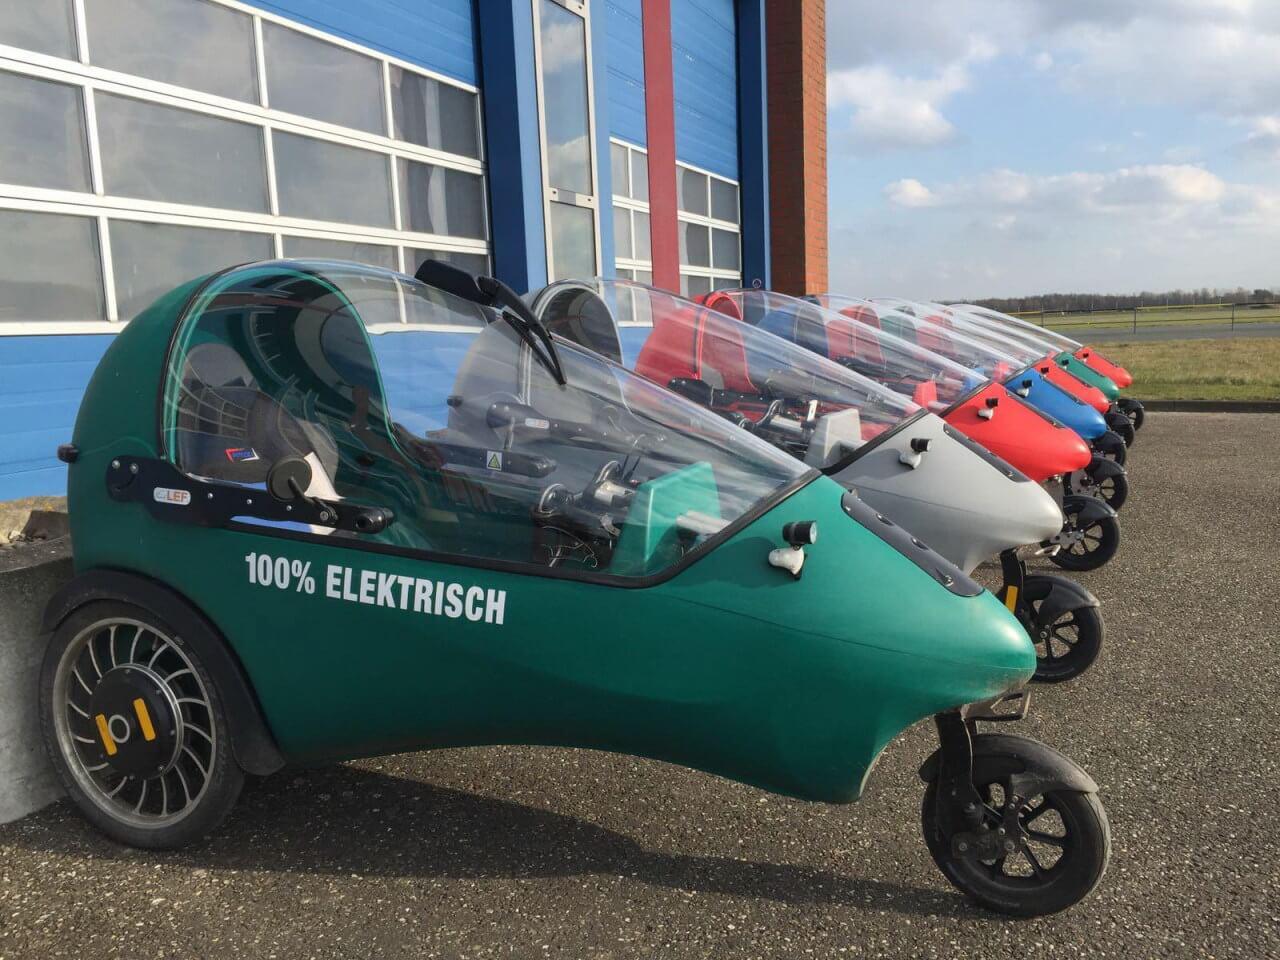 LEF: трехколесный микрокар с электроприводом и 3-мя вариантами батарей